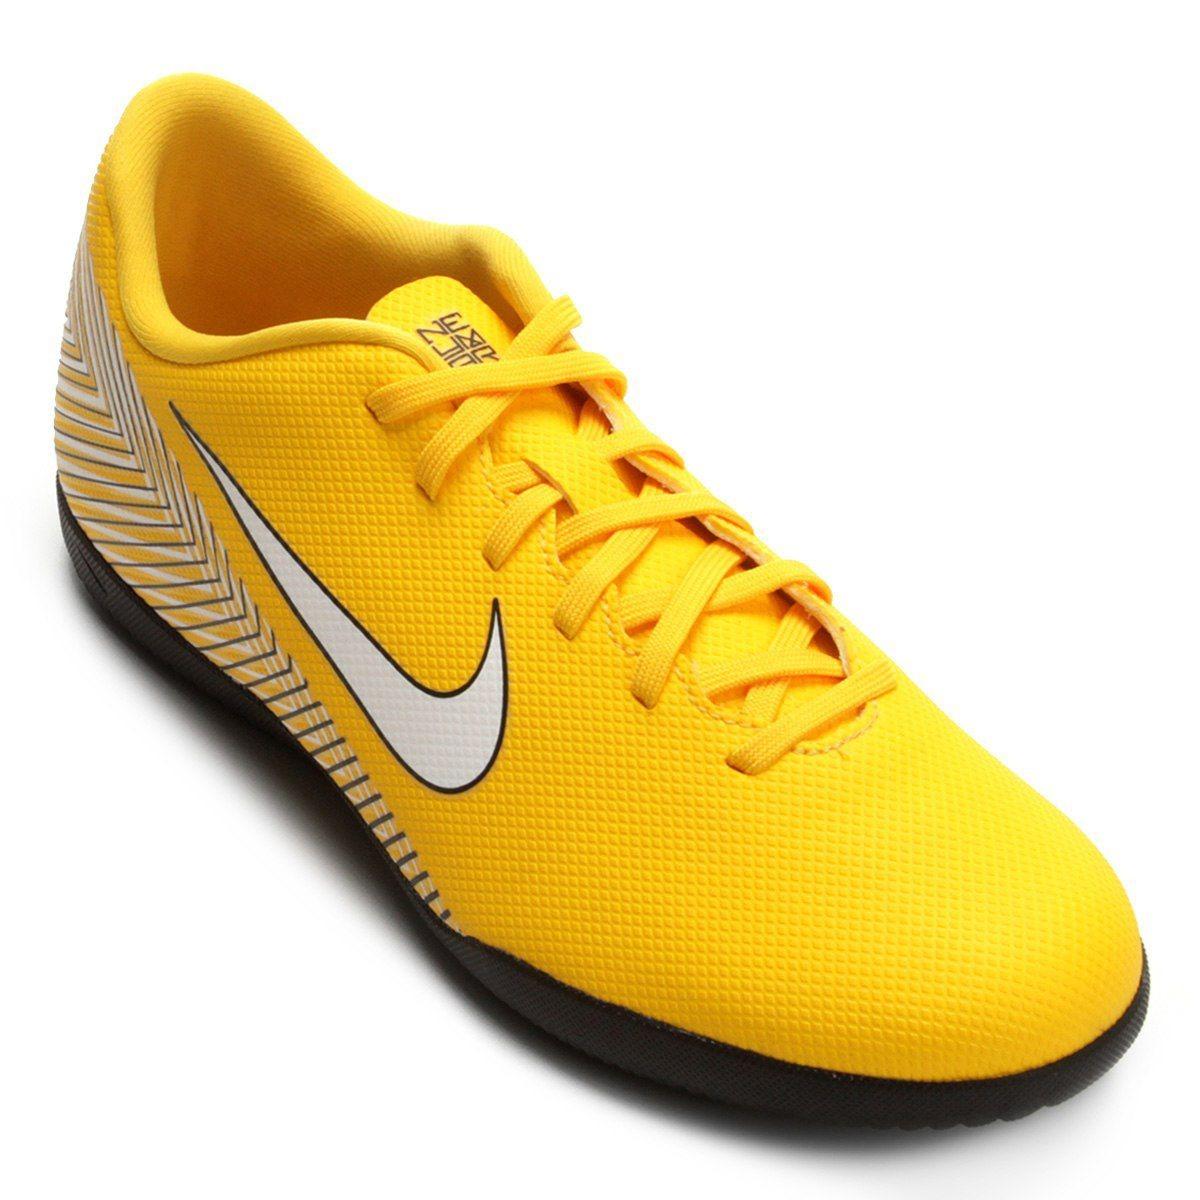 327062caae9f ... discount code for chuteira futsal nike mercurial vapor x 12 club njr  amarela. carregando zoom